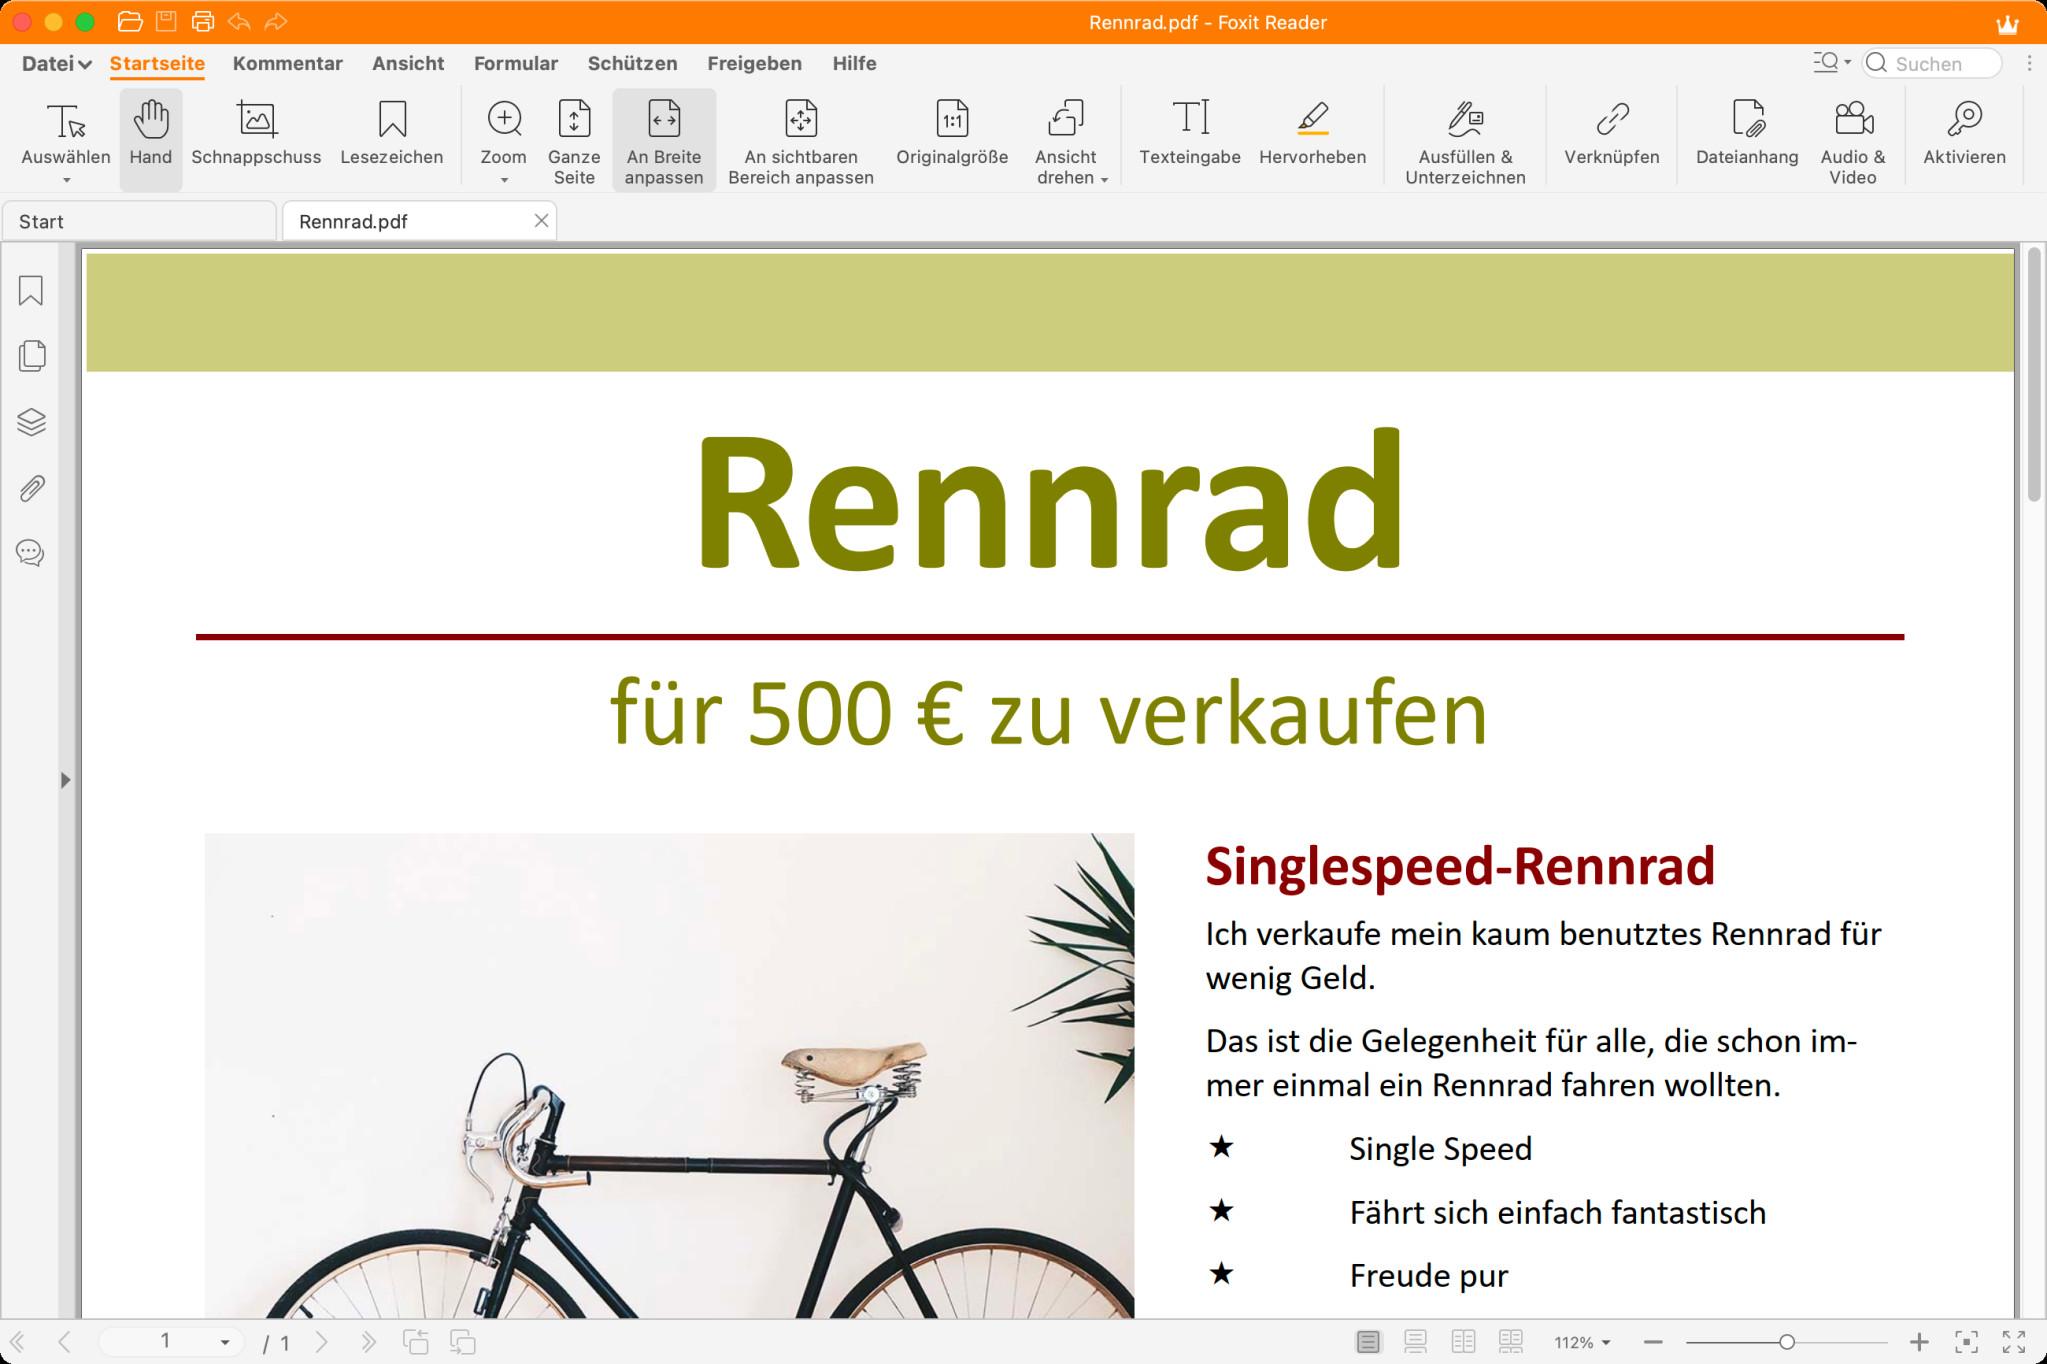 Screenshot 1 - Foxit PDF Reader (Mac)